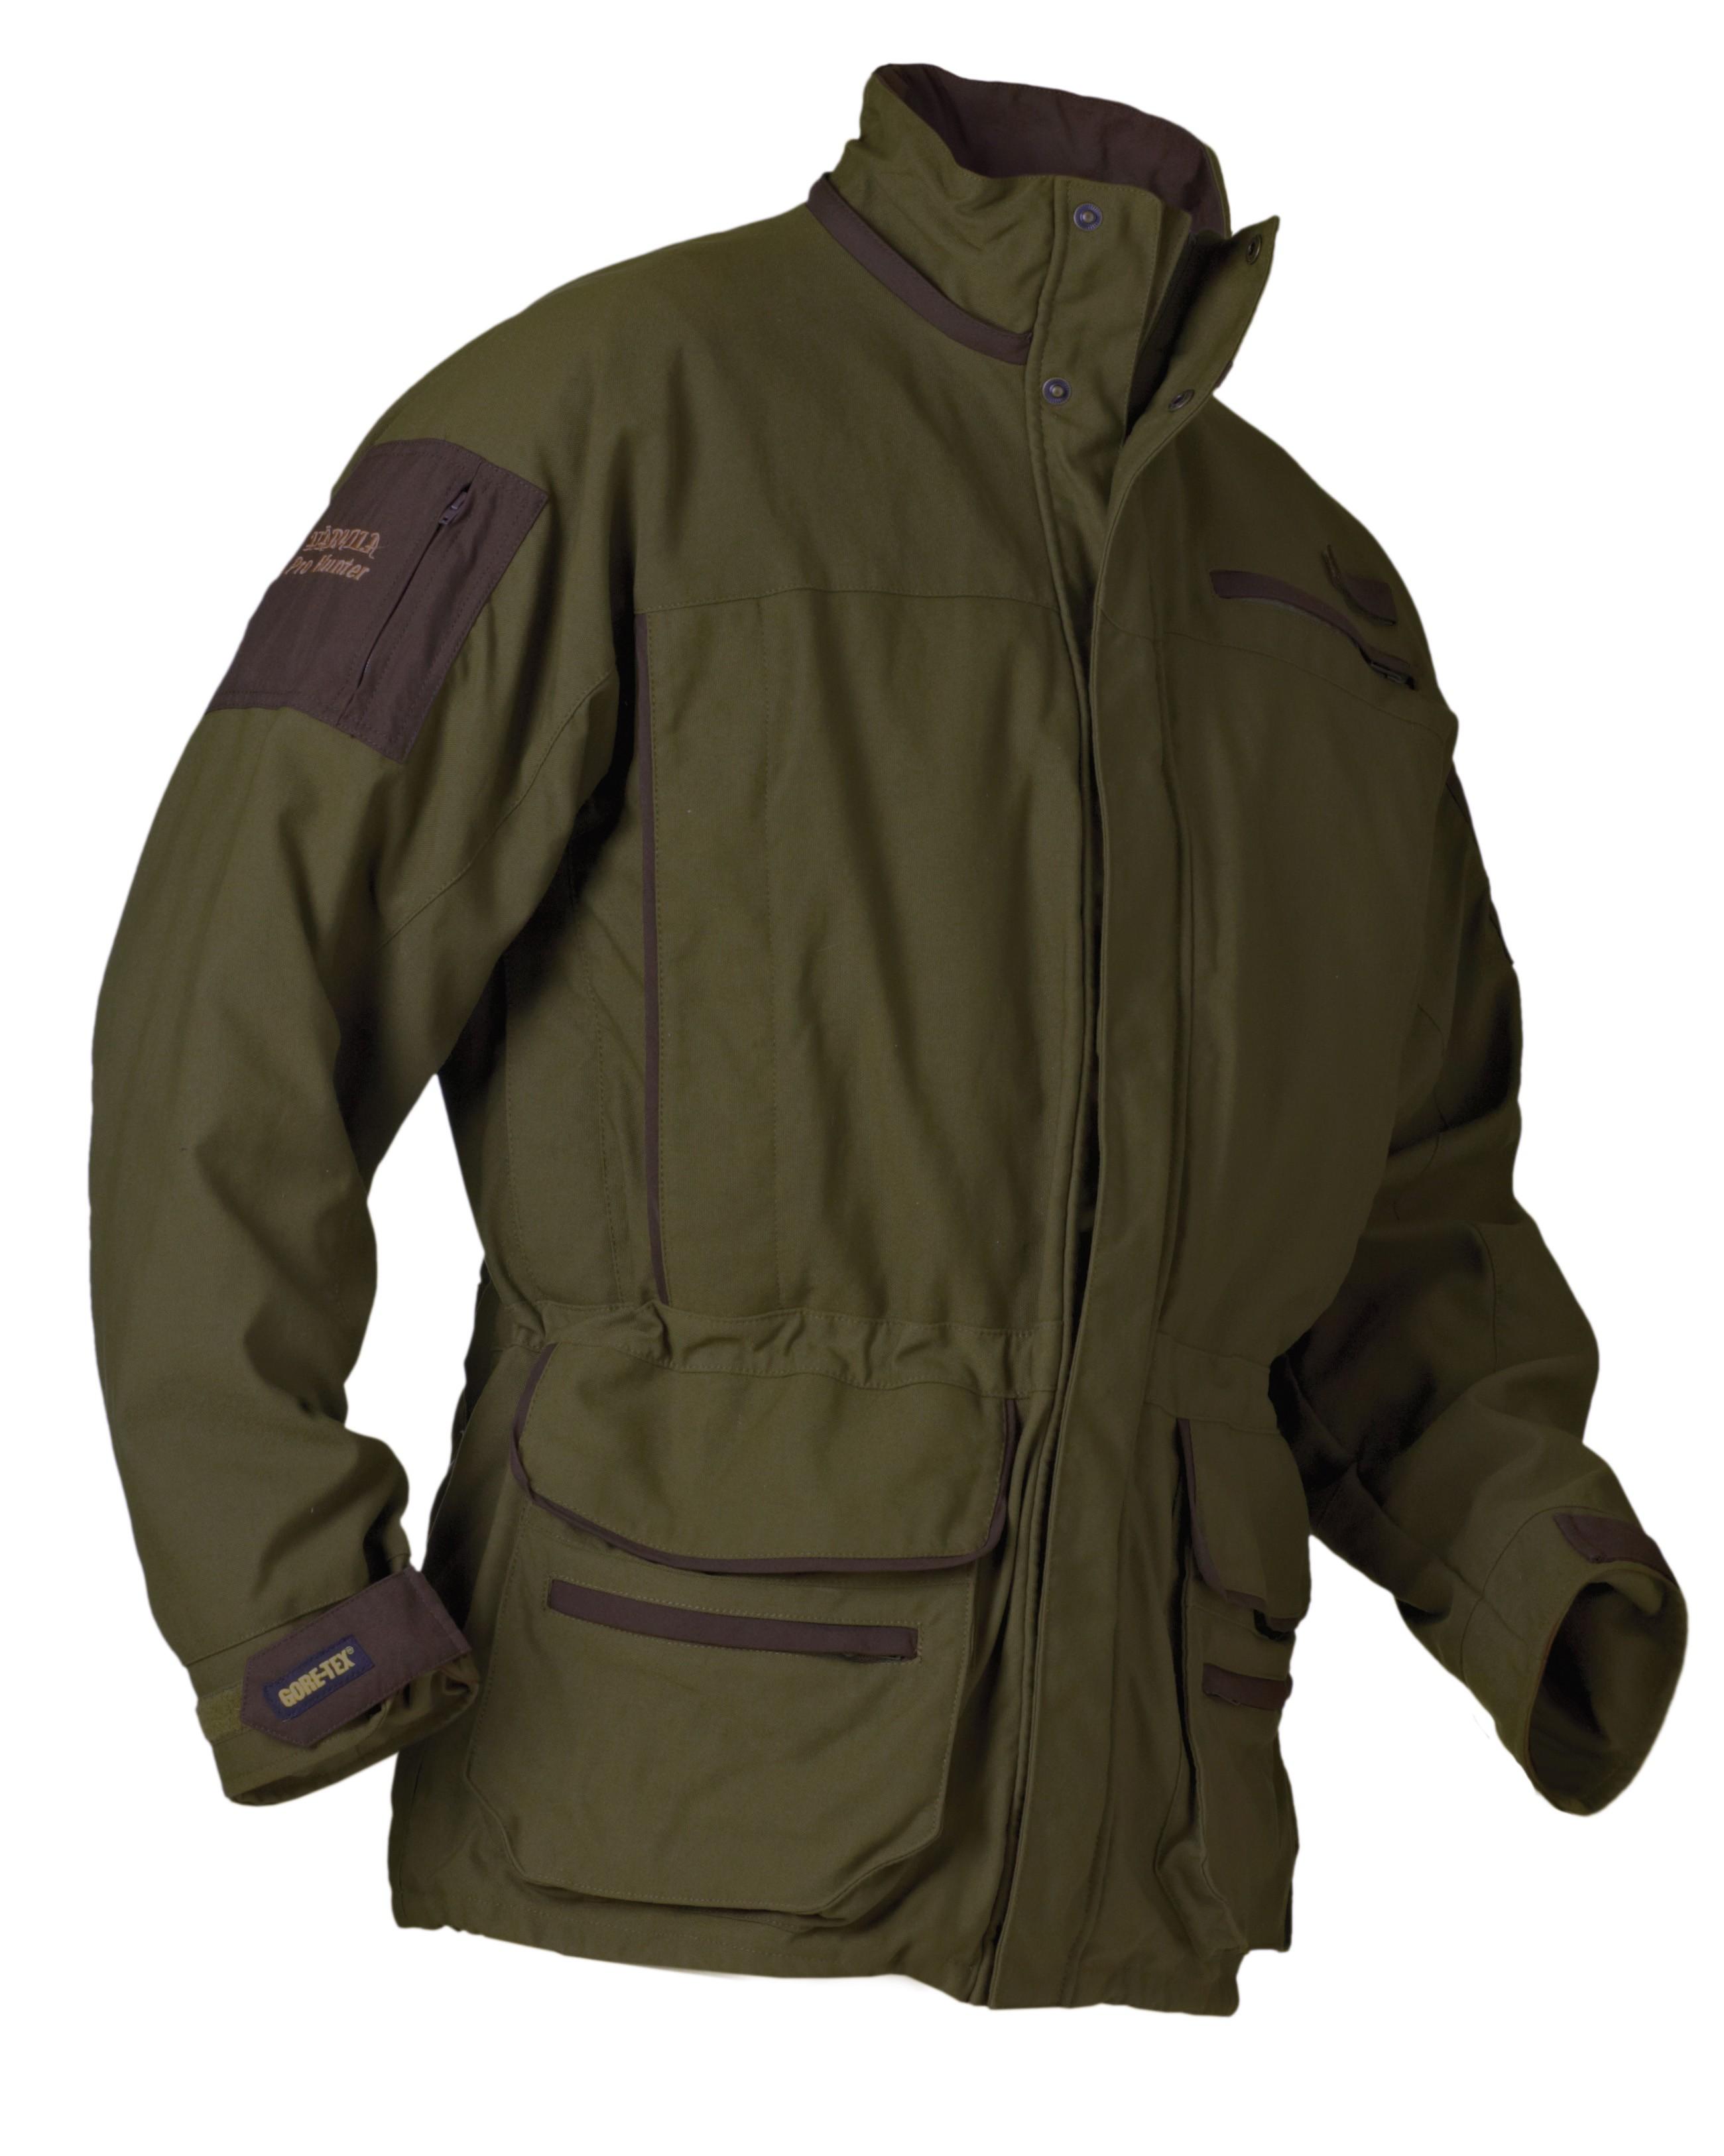 veste apres chasse club interchasse veste chasse oxford veste chasse camouflage promo. Black Bedroom Furniture Sets. Home Design Ideas